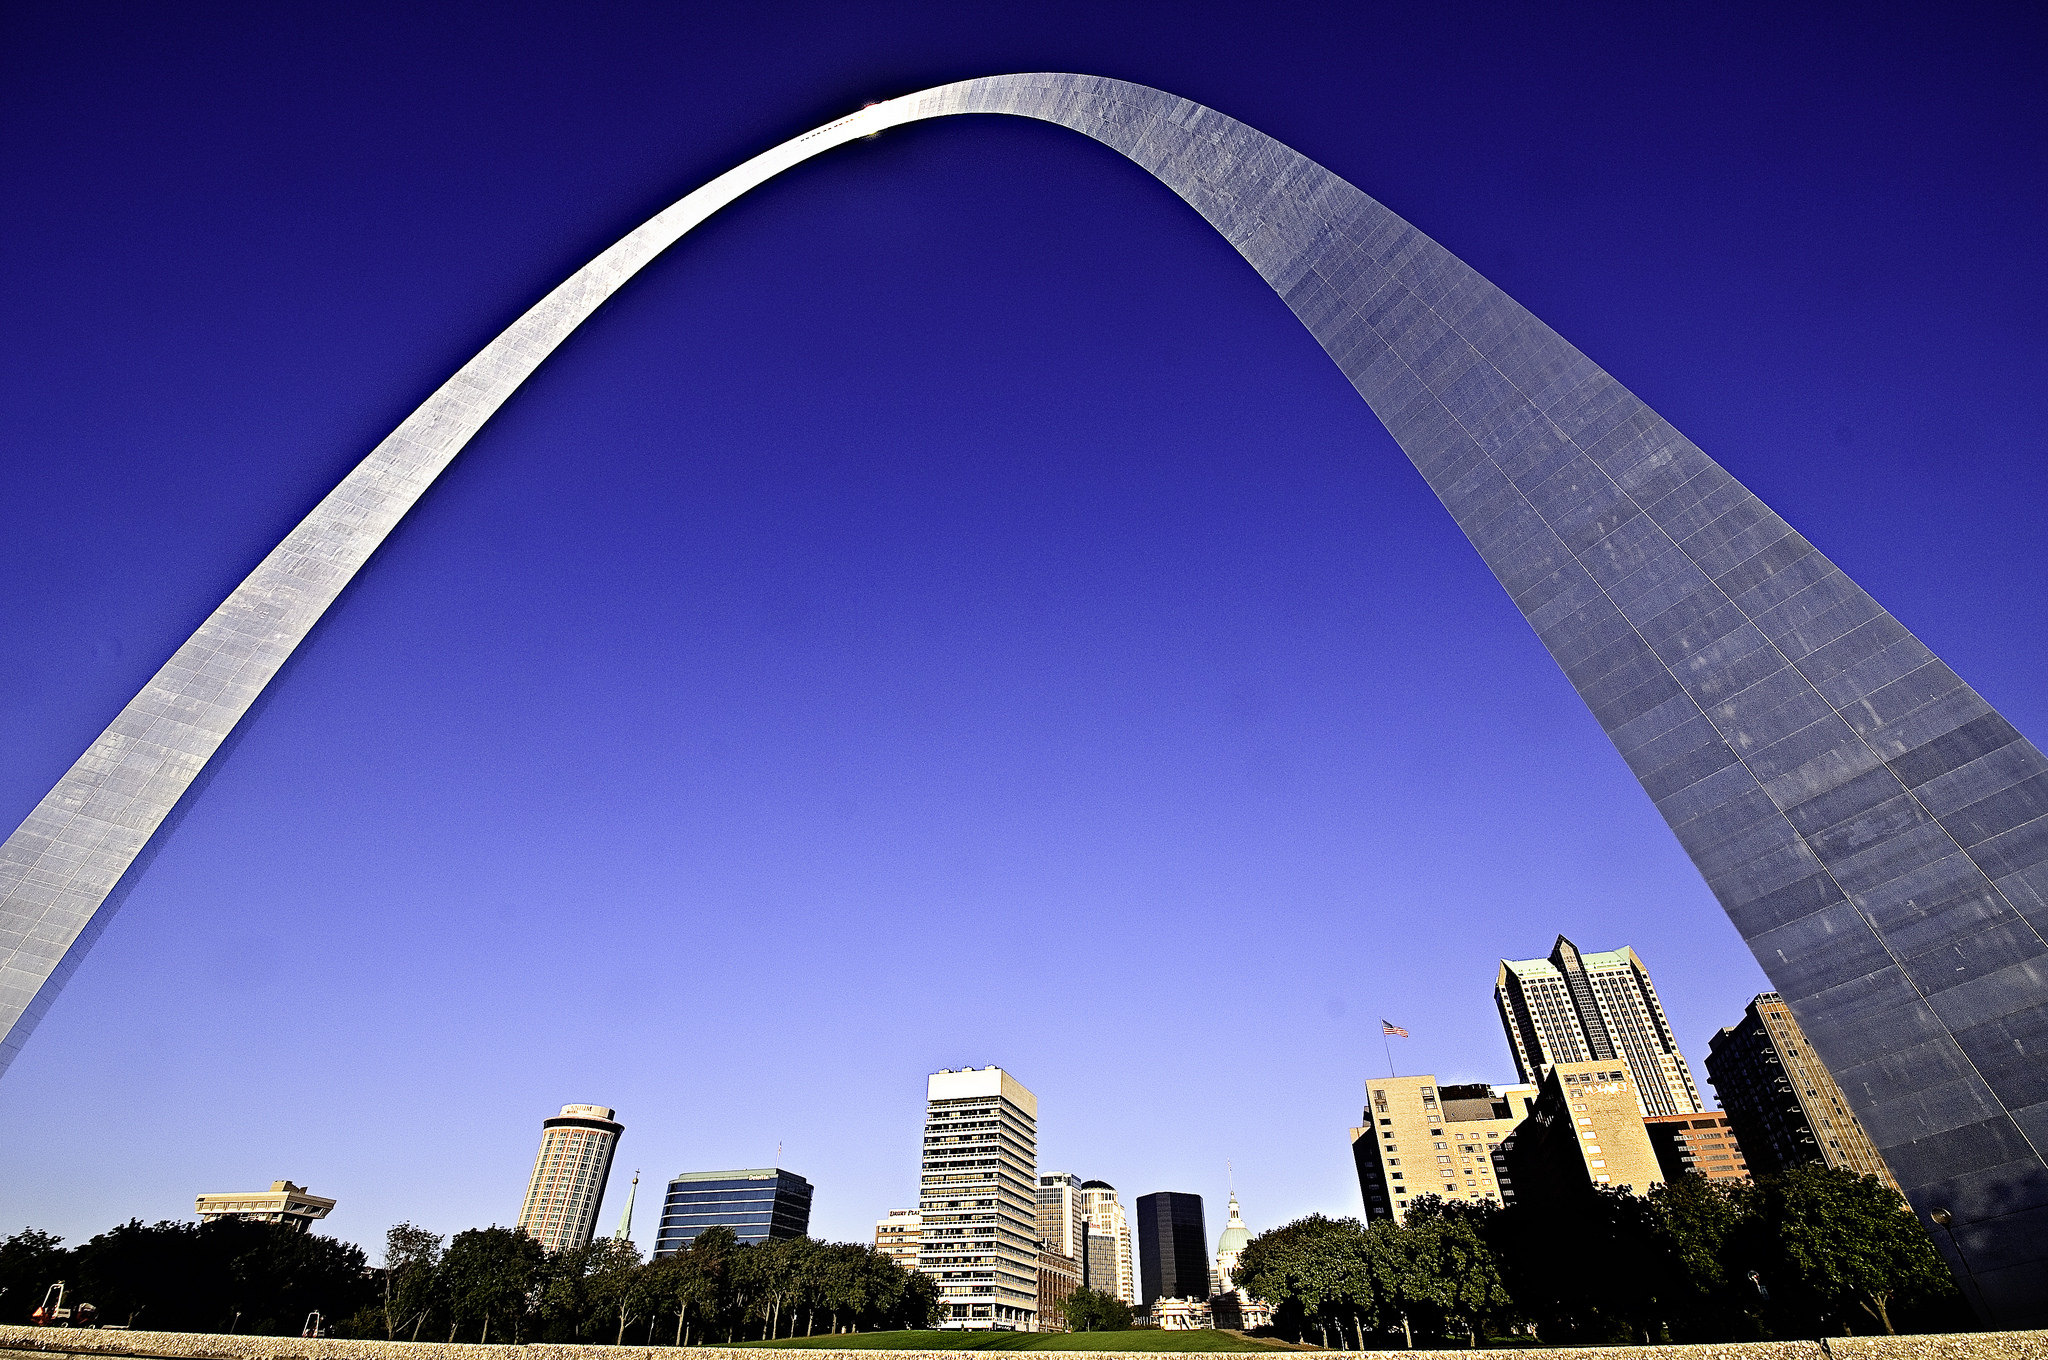 The Gateway Arch in St. Louis was designed by Eero Saarinen in 1947. Photo by Francisco Diez via Flickr/CC.